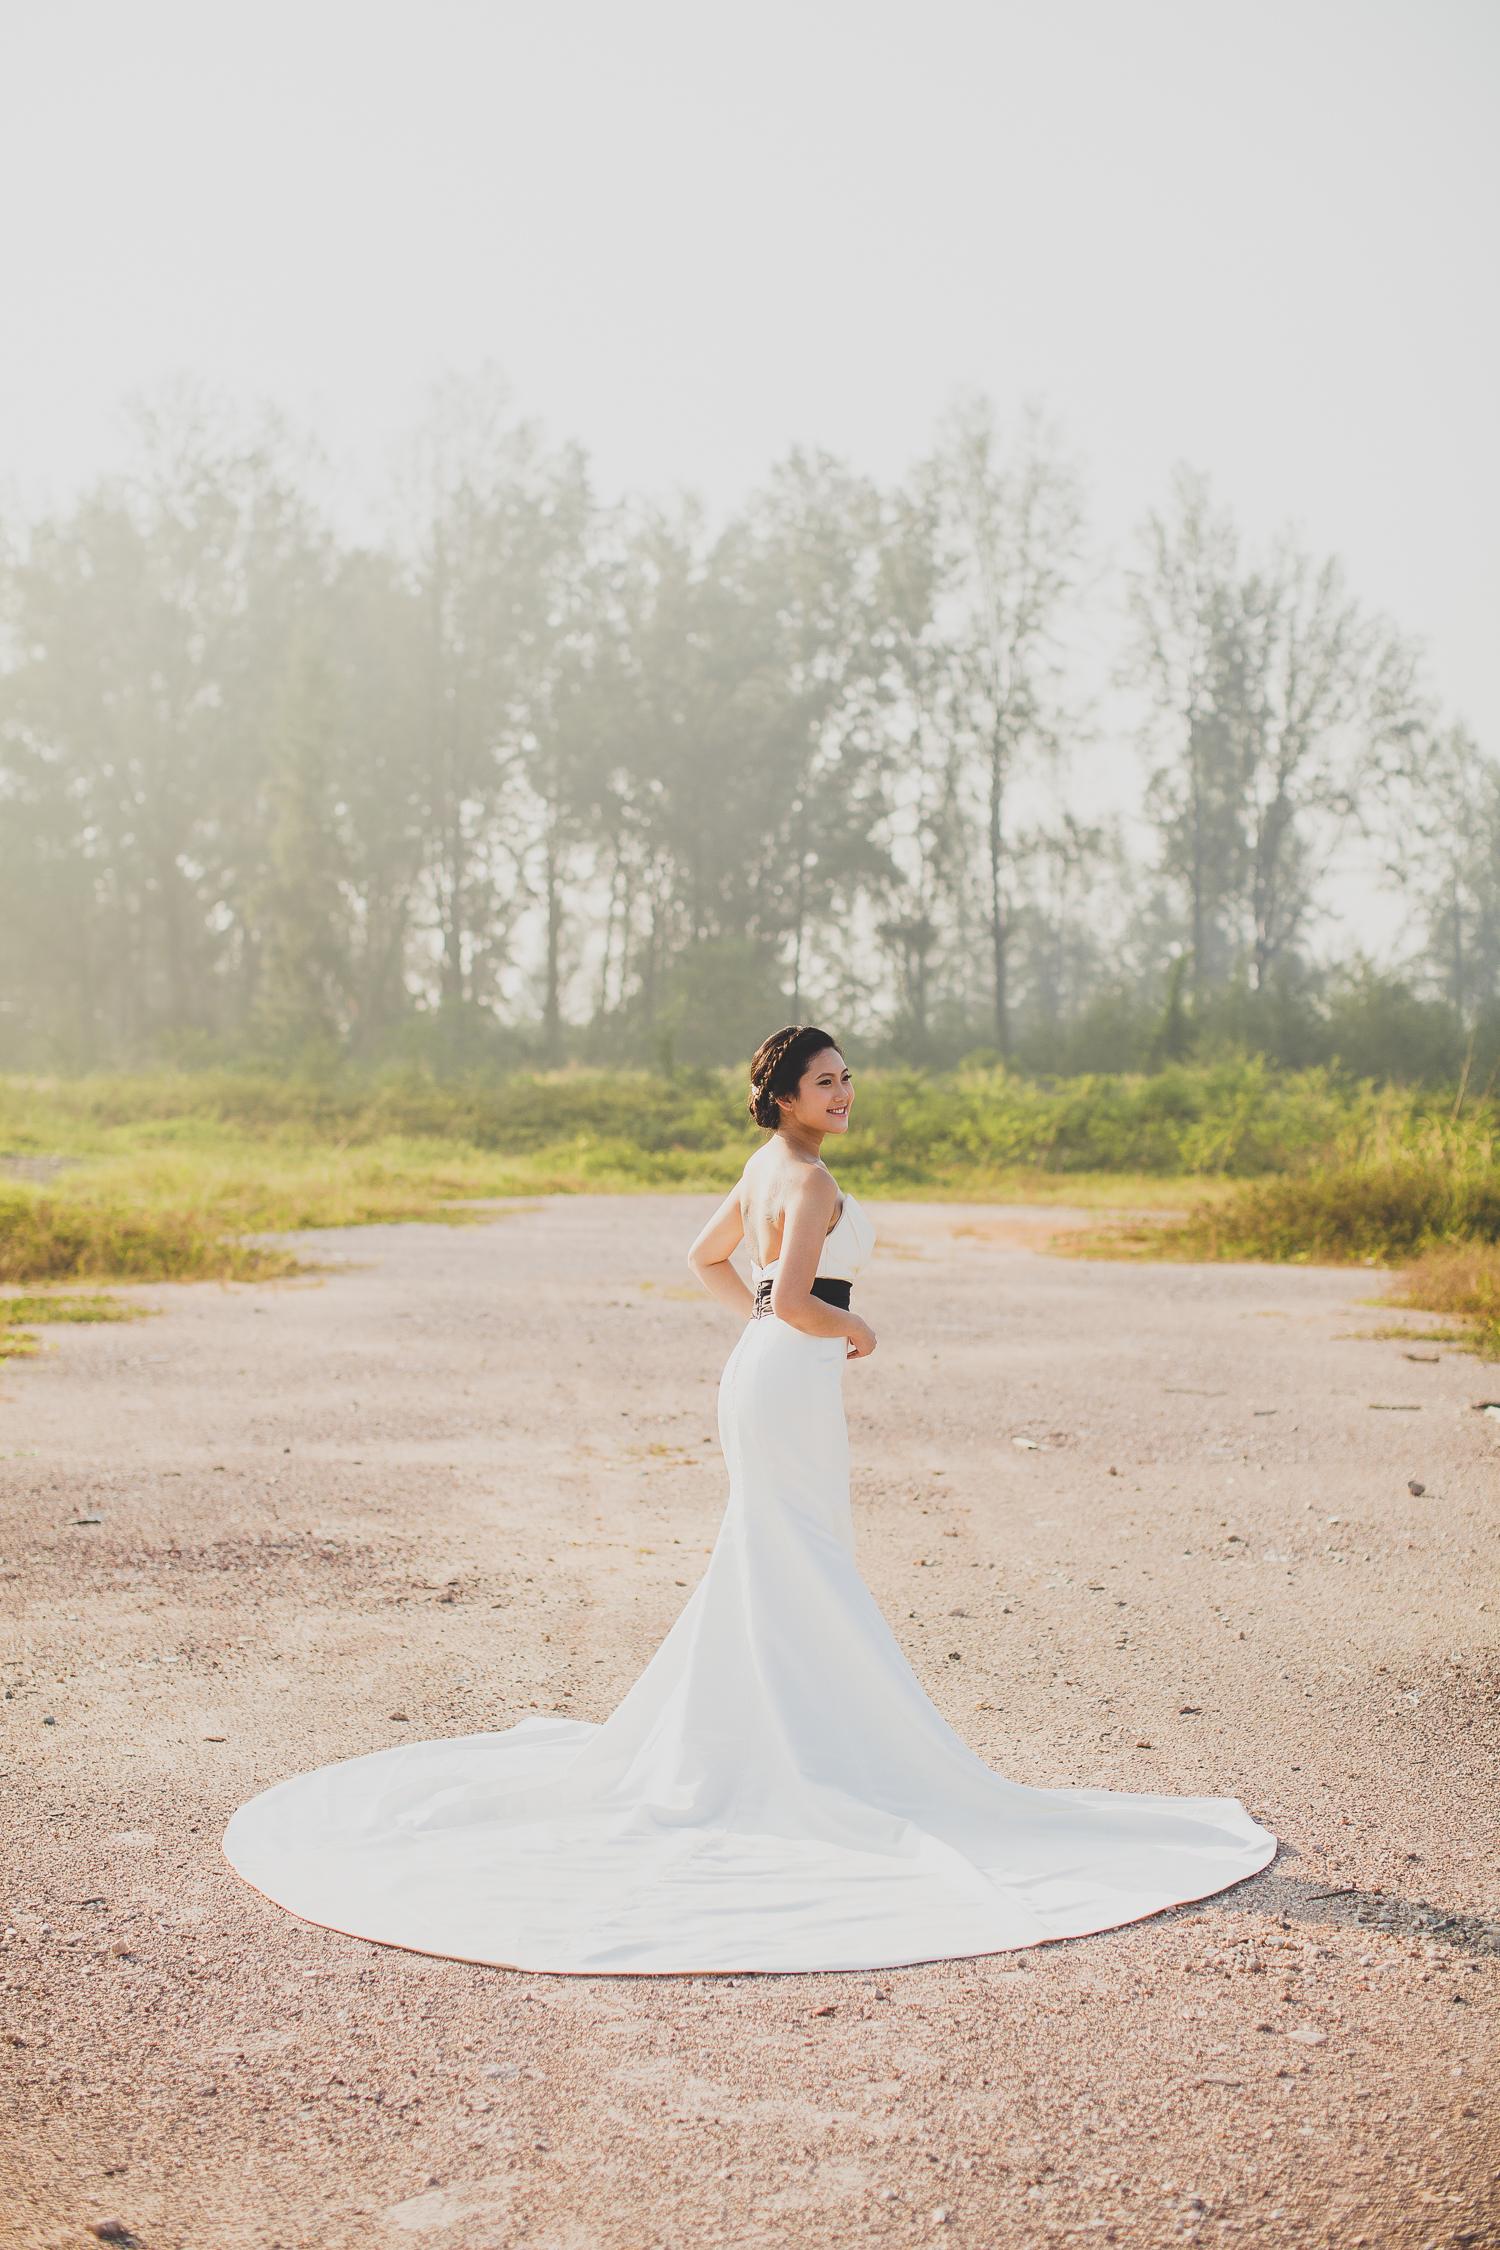 Singapore+Pre+Wedding+Photographer+Ziyang+Clara-0014.jpg